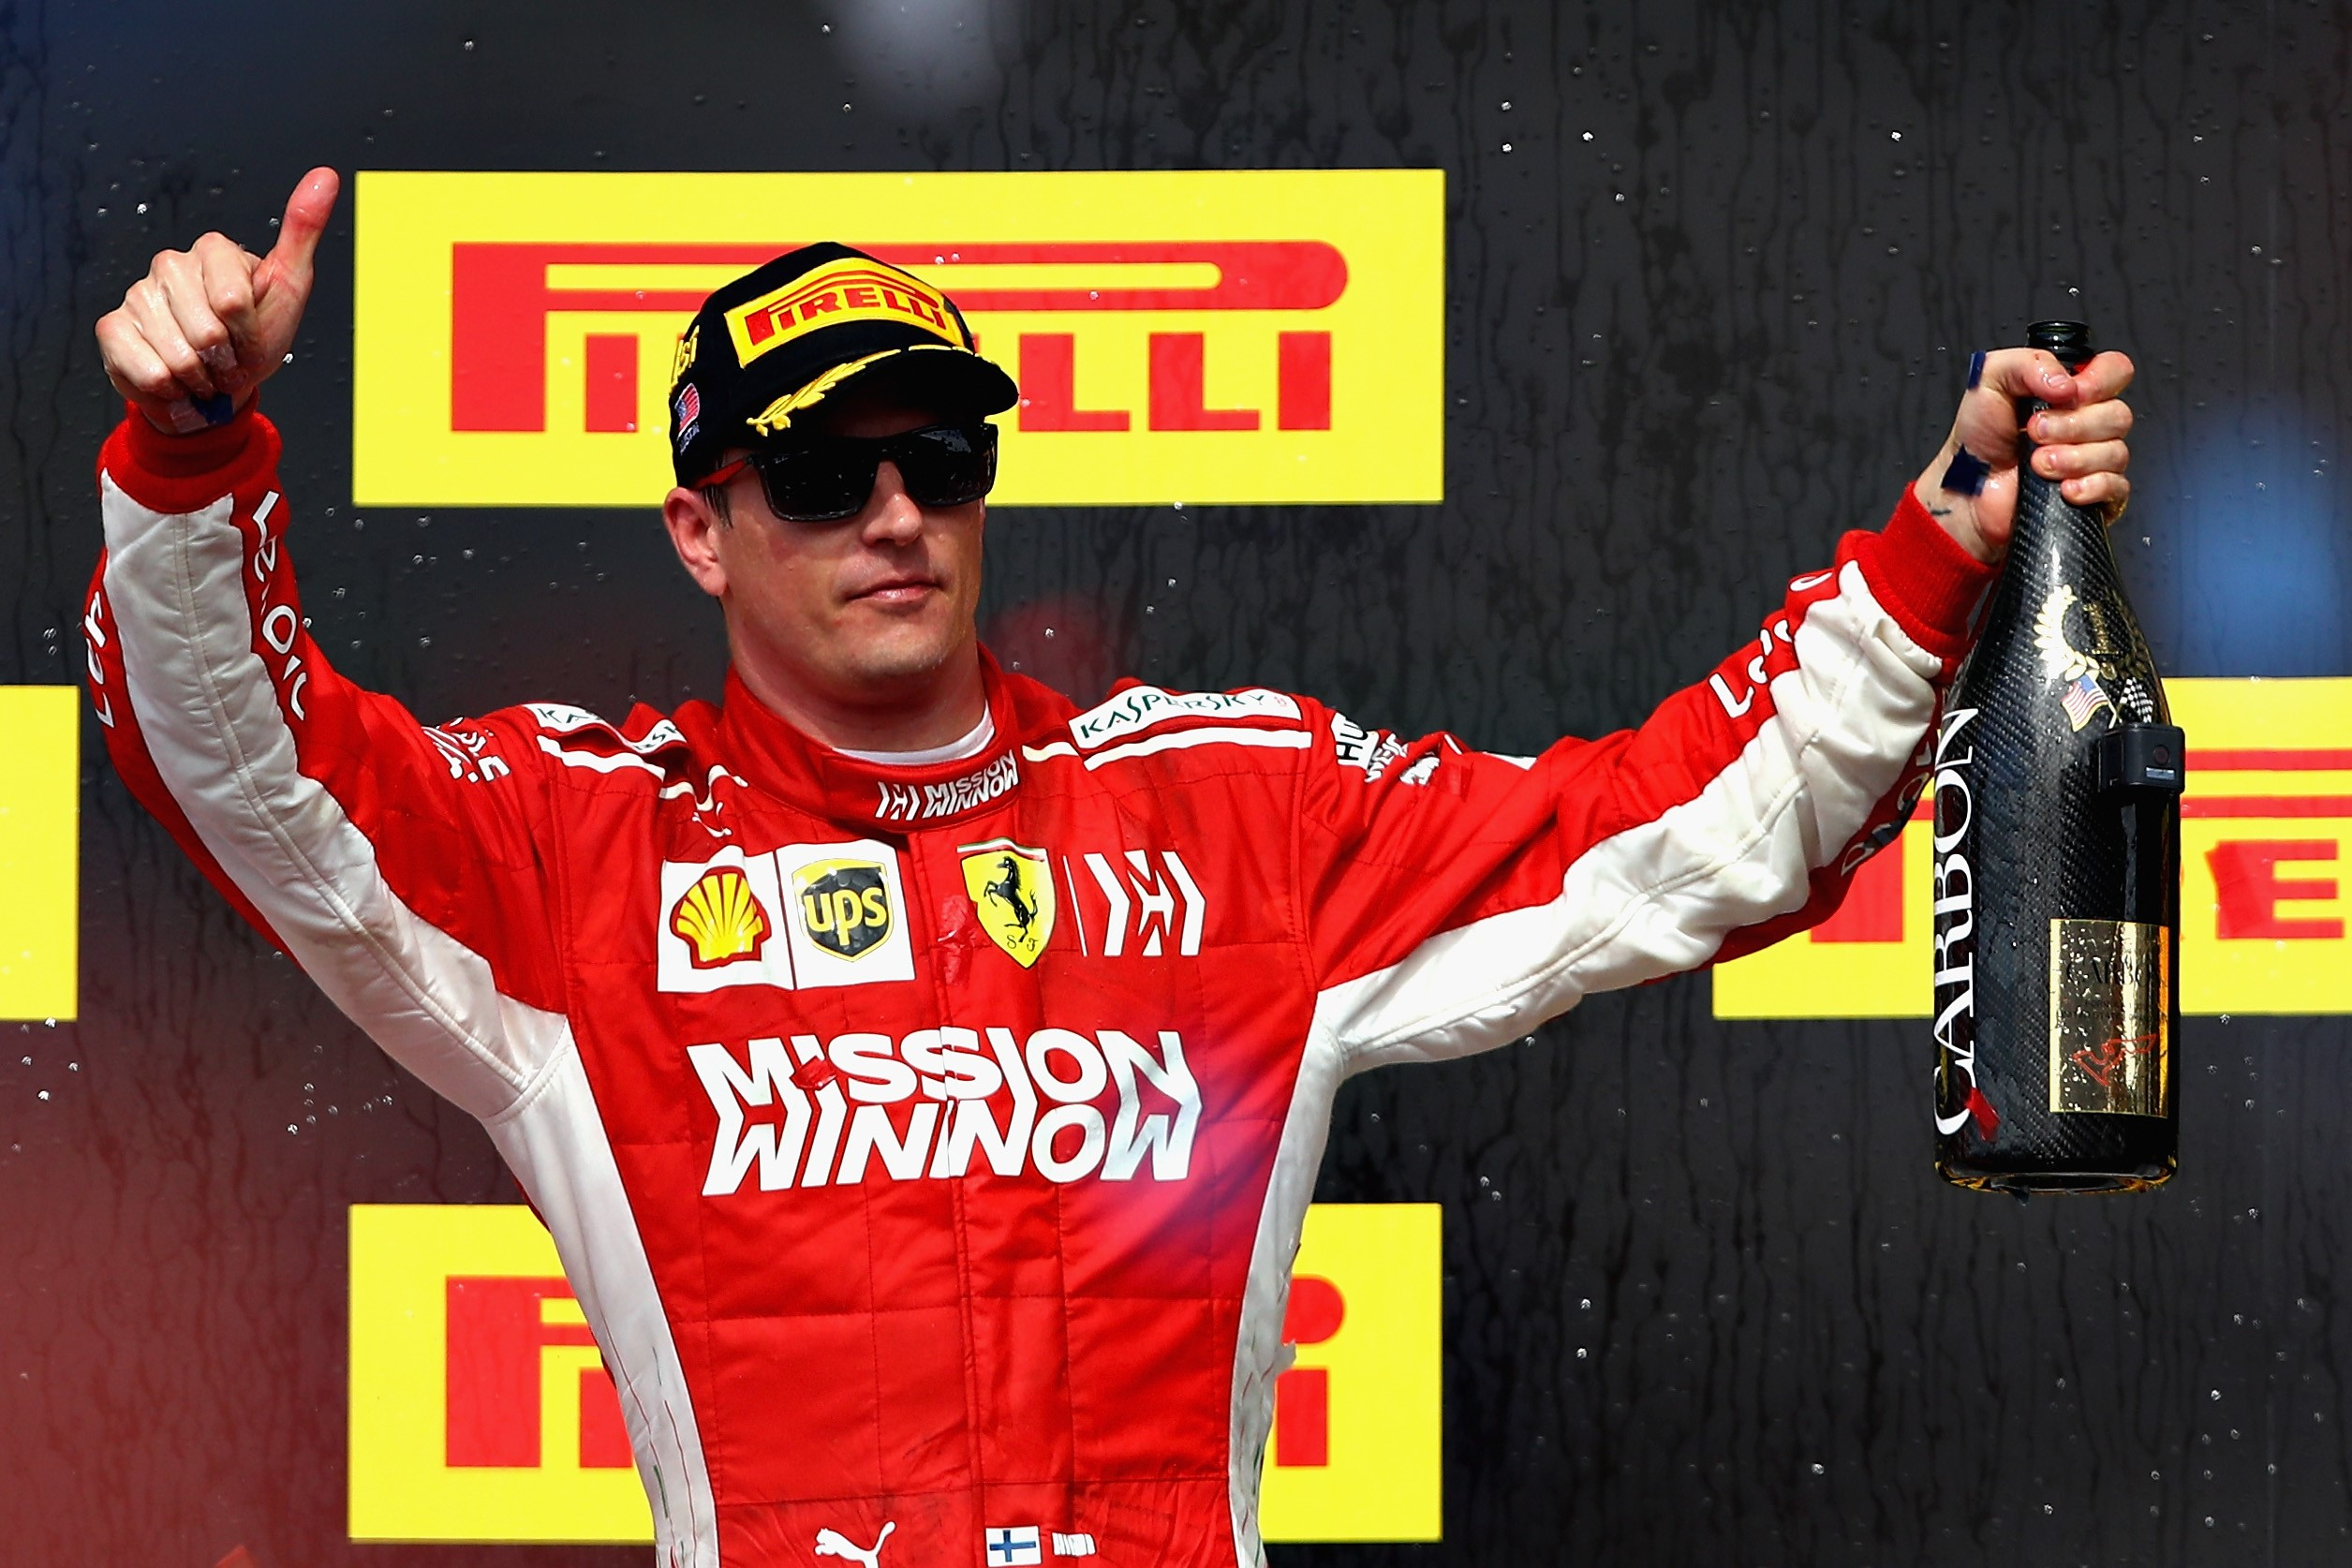 Kimi Räikkönen (Ferrari) au Grand Prix des Etats-Unis 2018